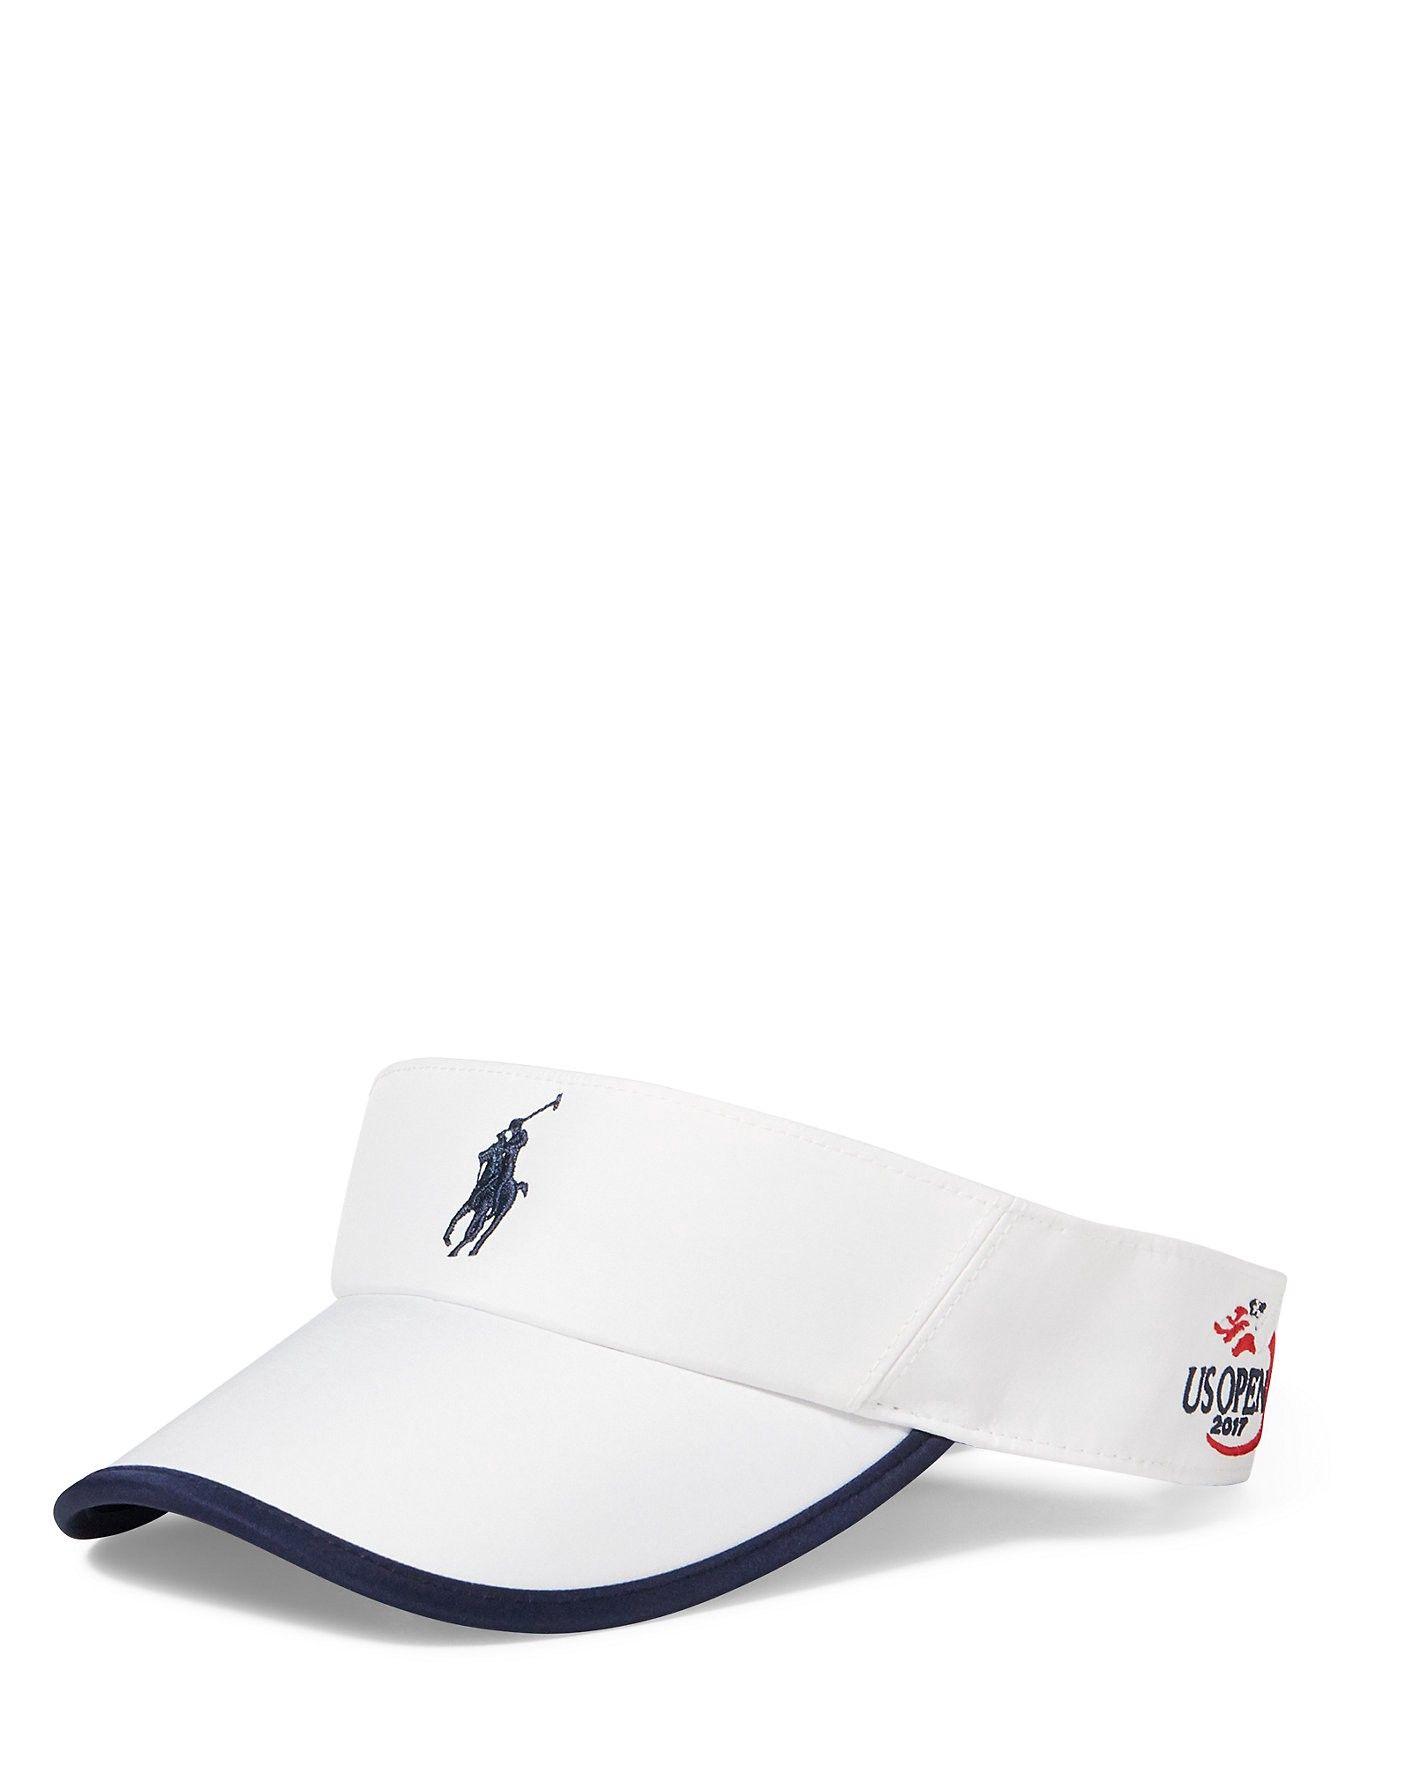 6185b8e137ef8 Polo Us Open Tennis Hat – Rockwall Auction